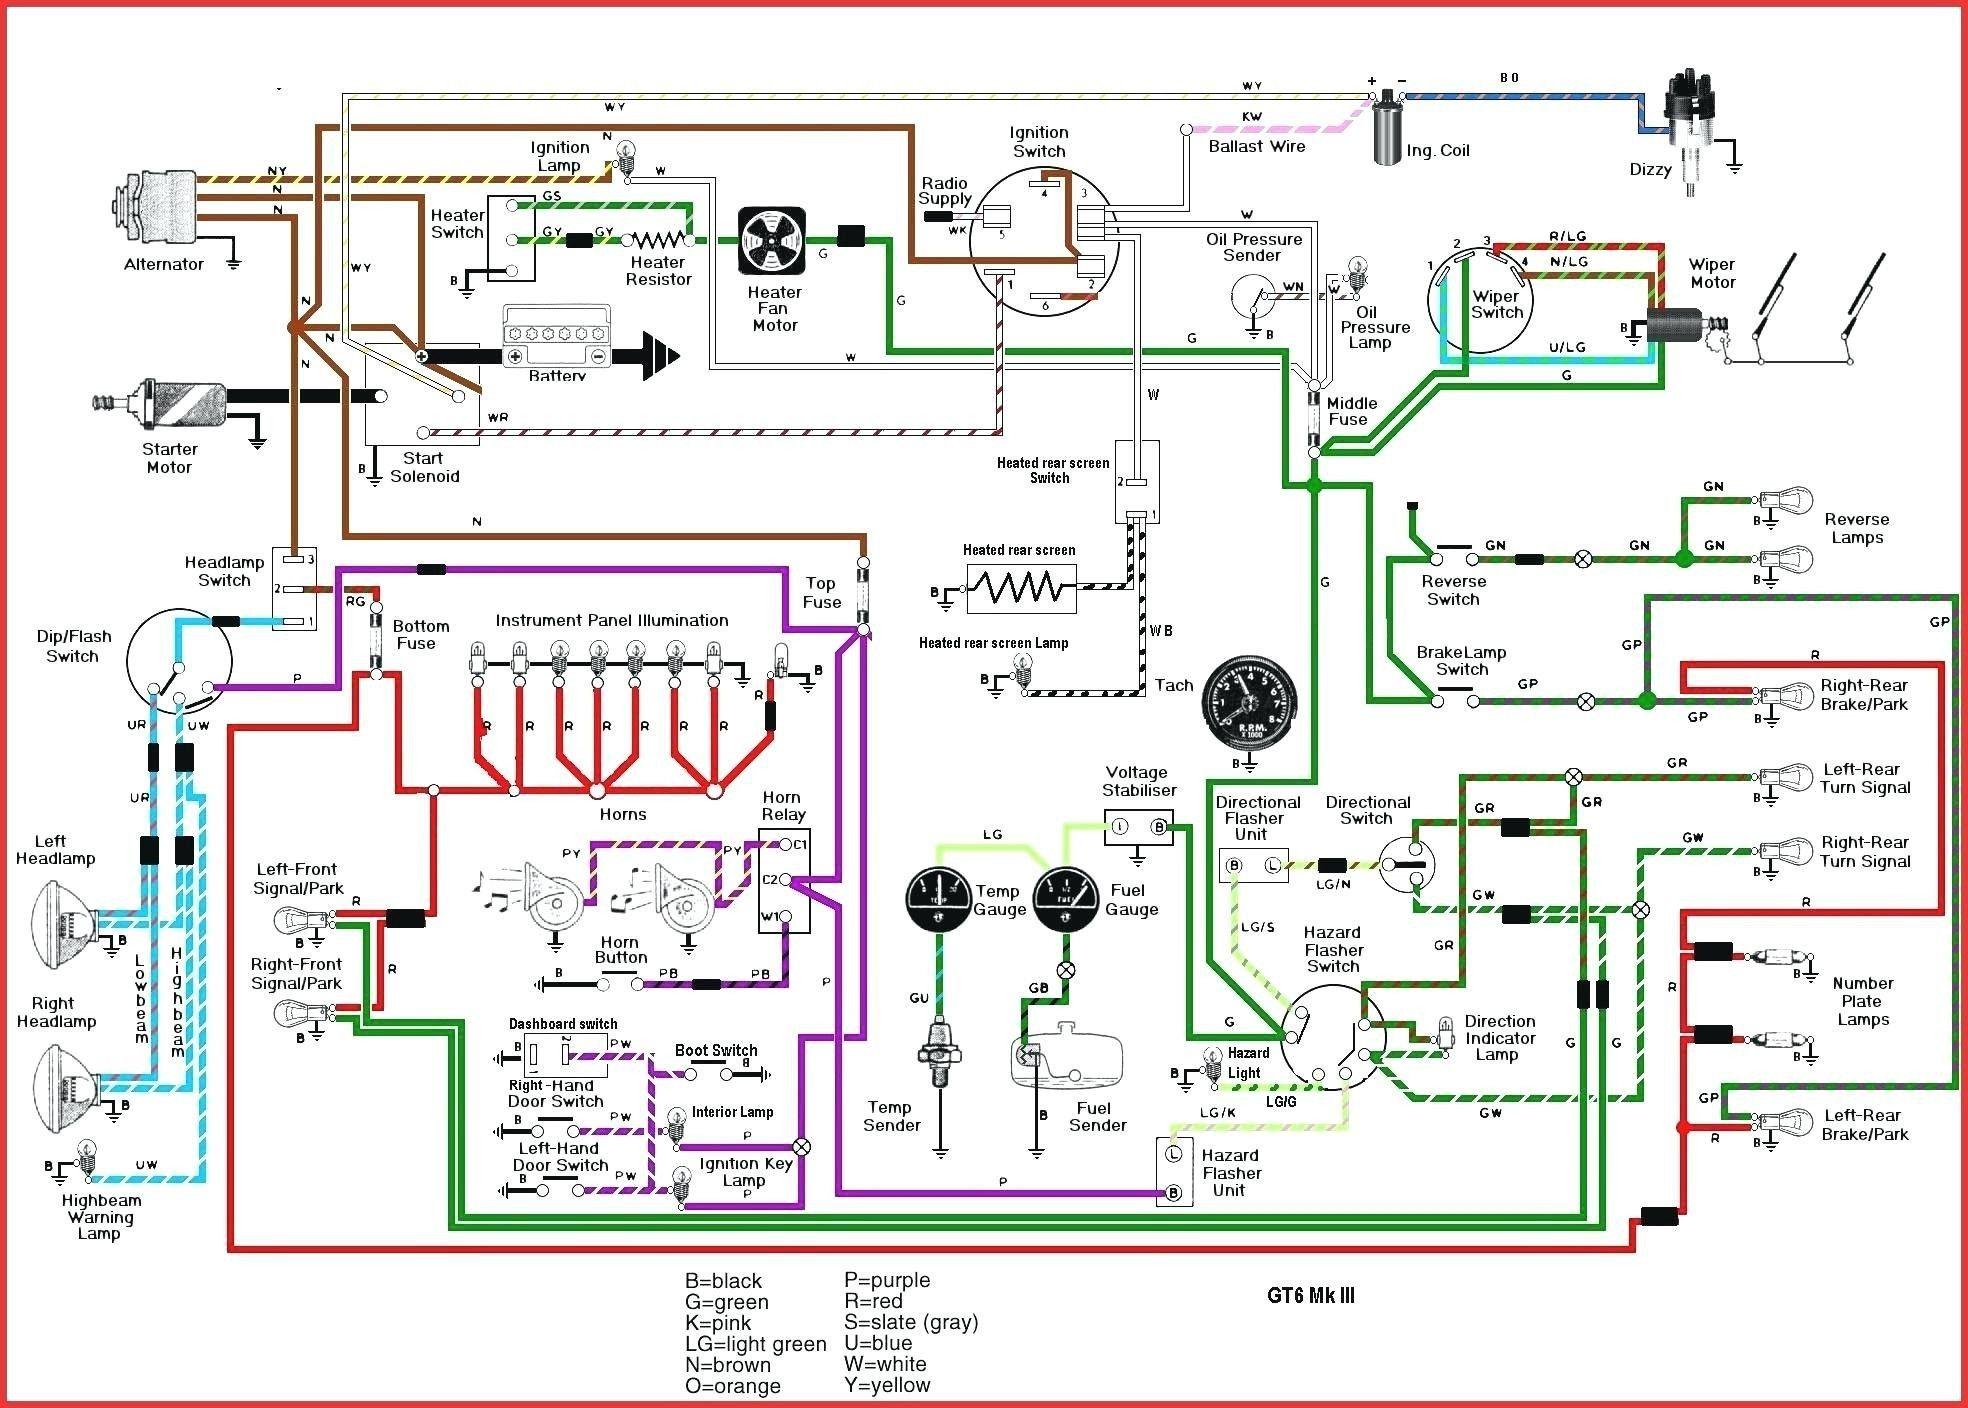 New Home Wiring Diagram Diagram Wiringdiagram Diagramming Diagramm Visuals Visualisatio Electrical Circuit Diagram House Wiring Electrical Wiring Diagram